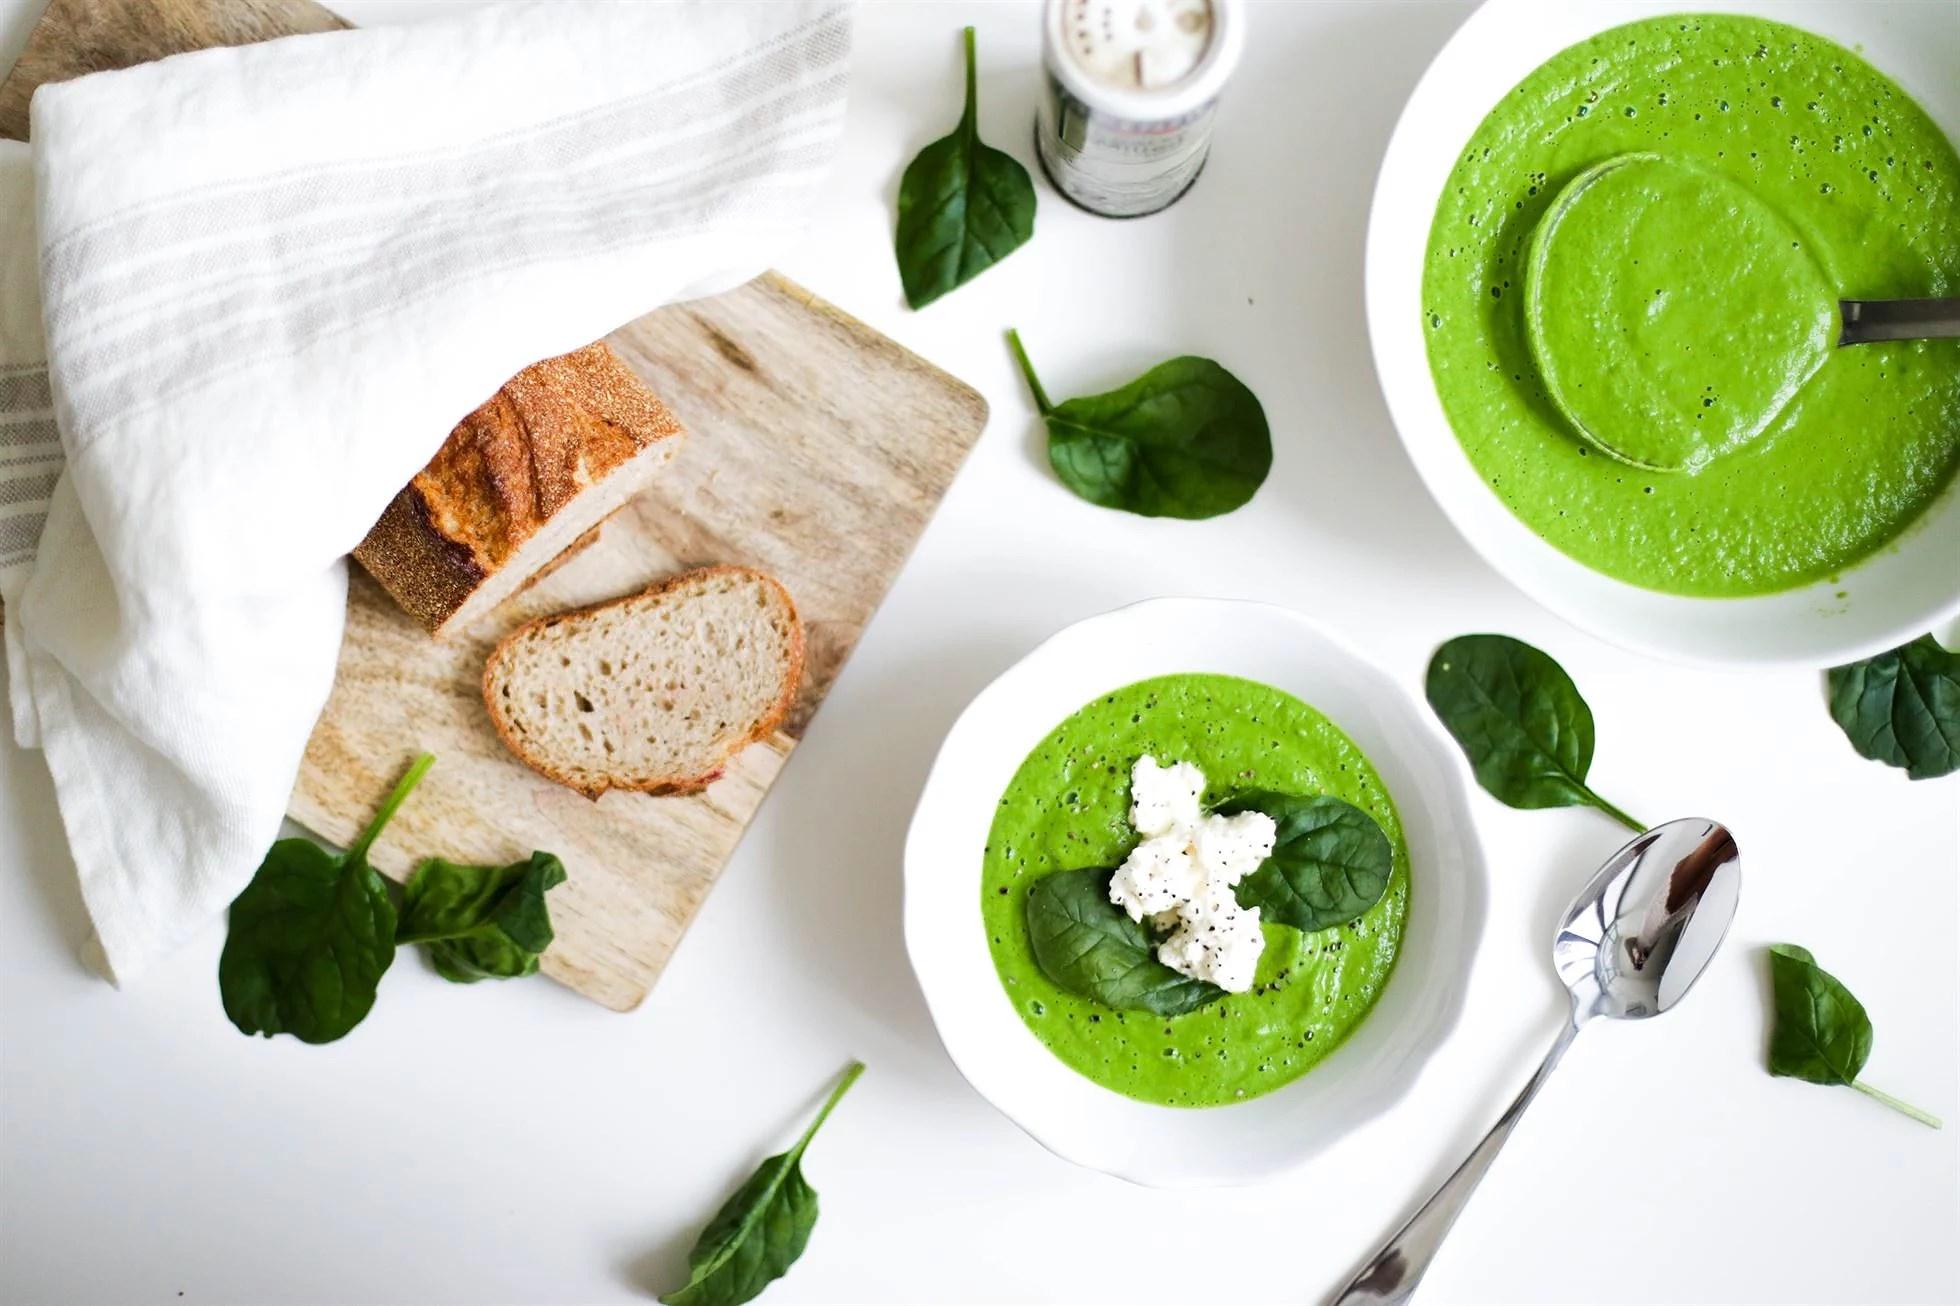 SUPER EASY, SUPER HEALTHY BROCCOLI & SPINACH SOUP WITH FETA MIX